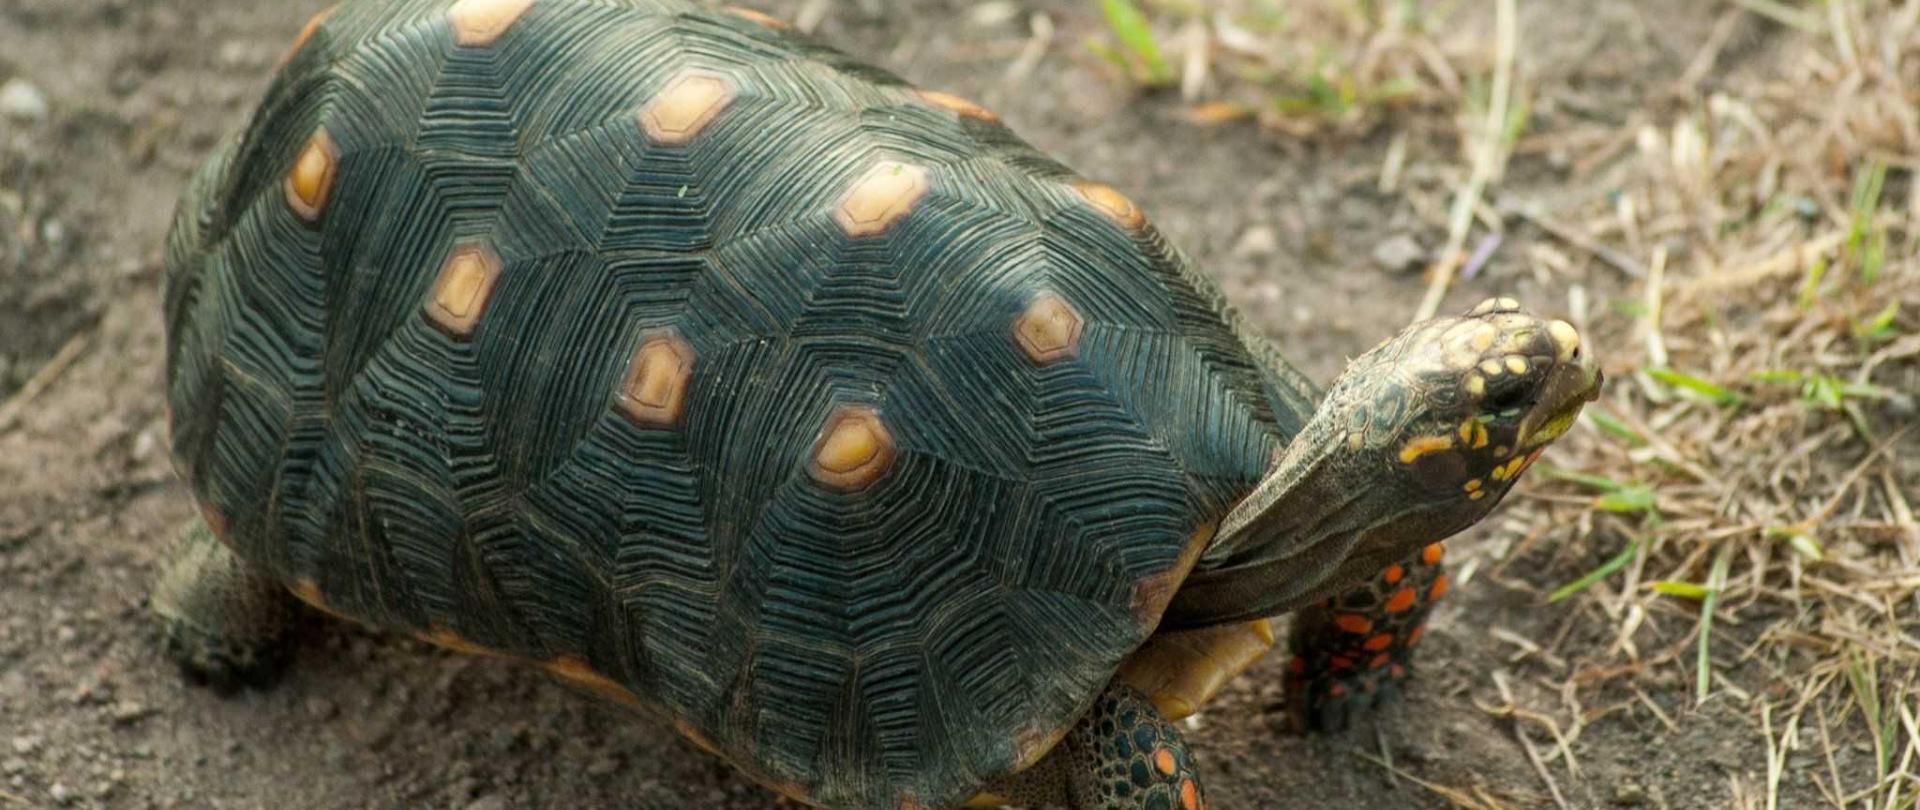 Tortoises wander Saint Joseph's.jpg